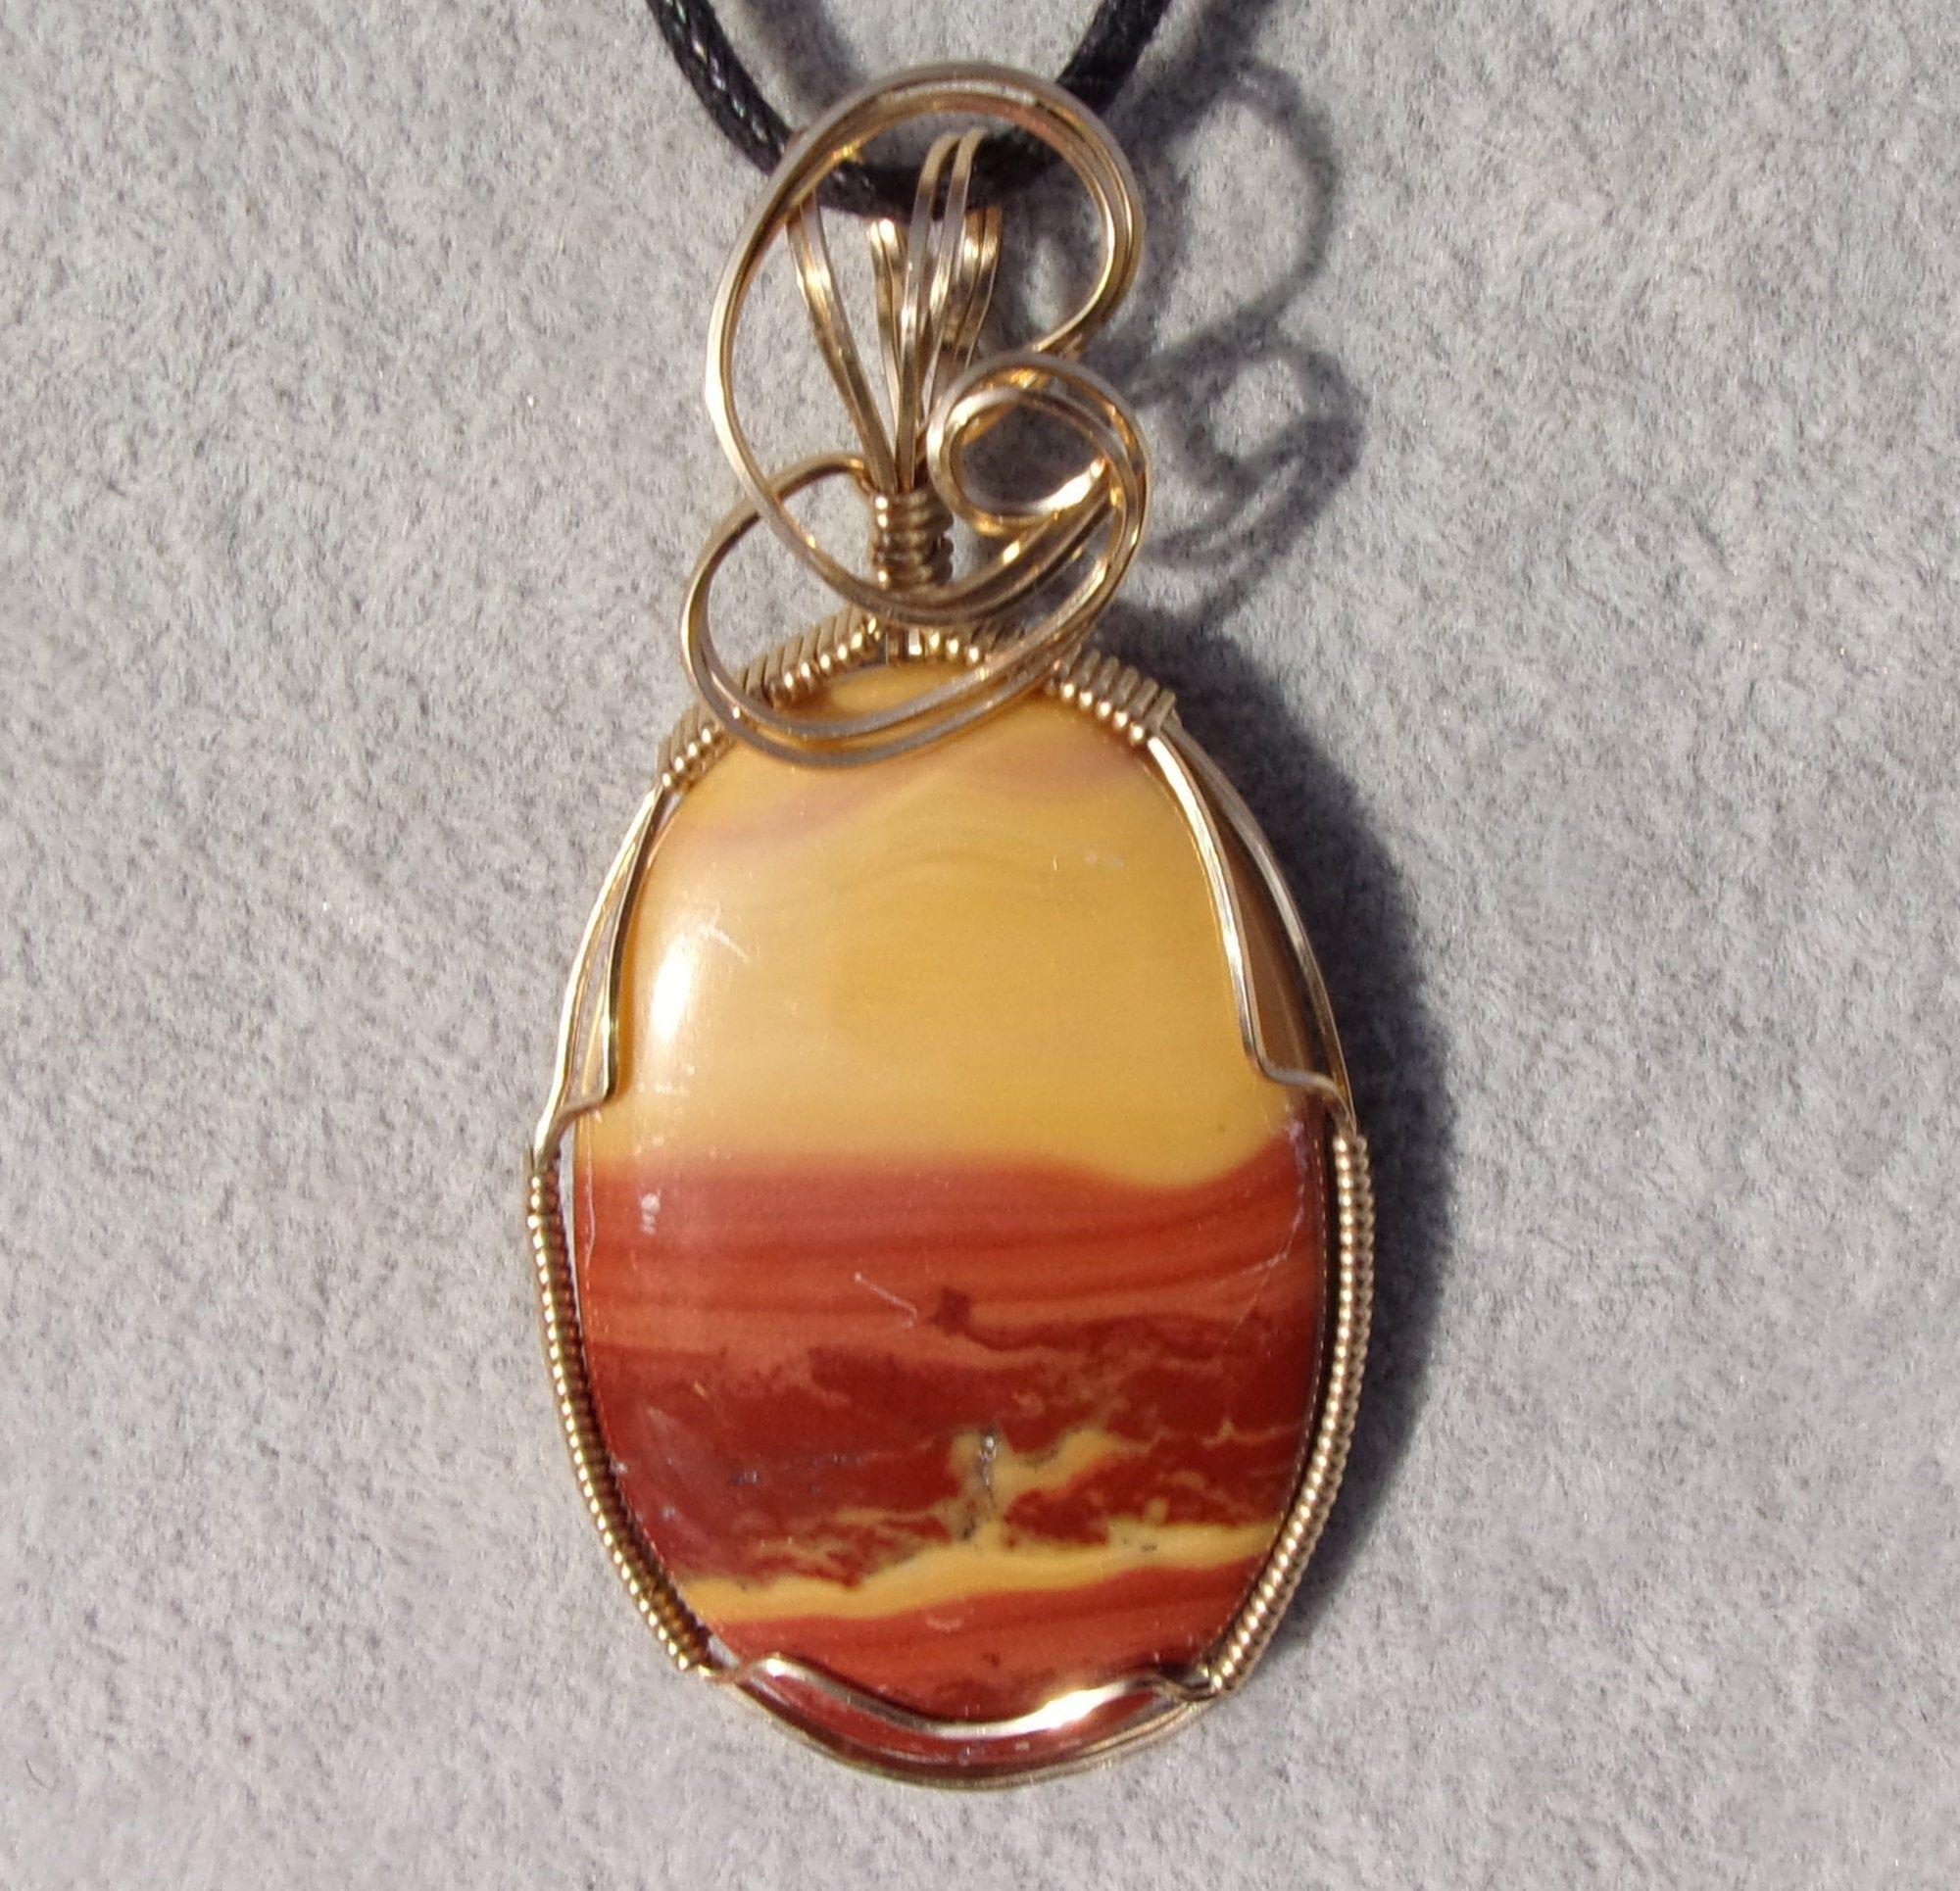 Petrified Peanut Wood Jasper Pendants Jewelry Supply Jasper Beads Healing Jasper Crystals for Wire-wrap Rings Peanut Wood Cabochon Stone